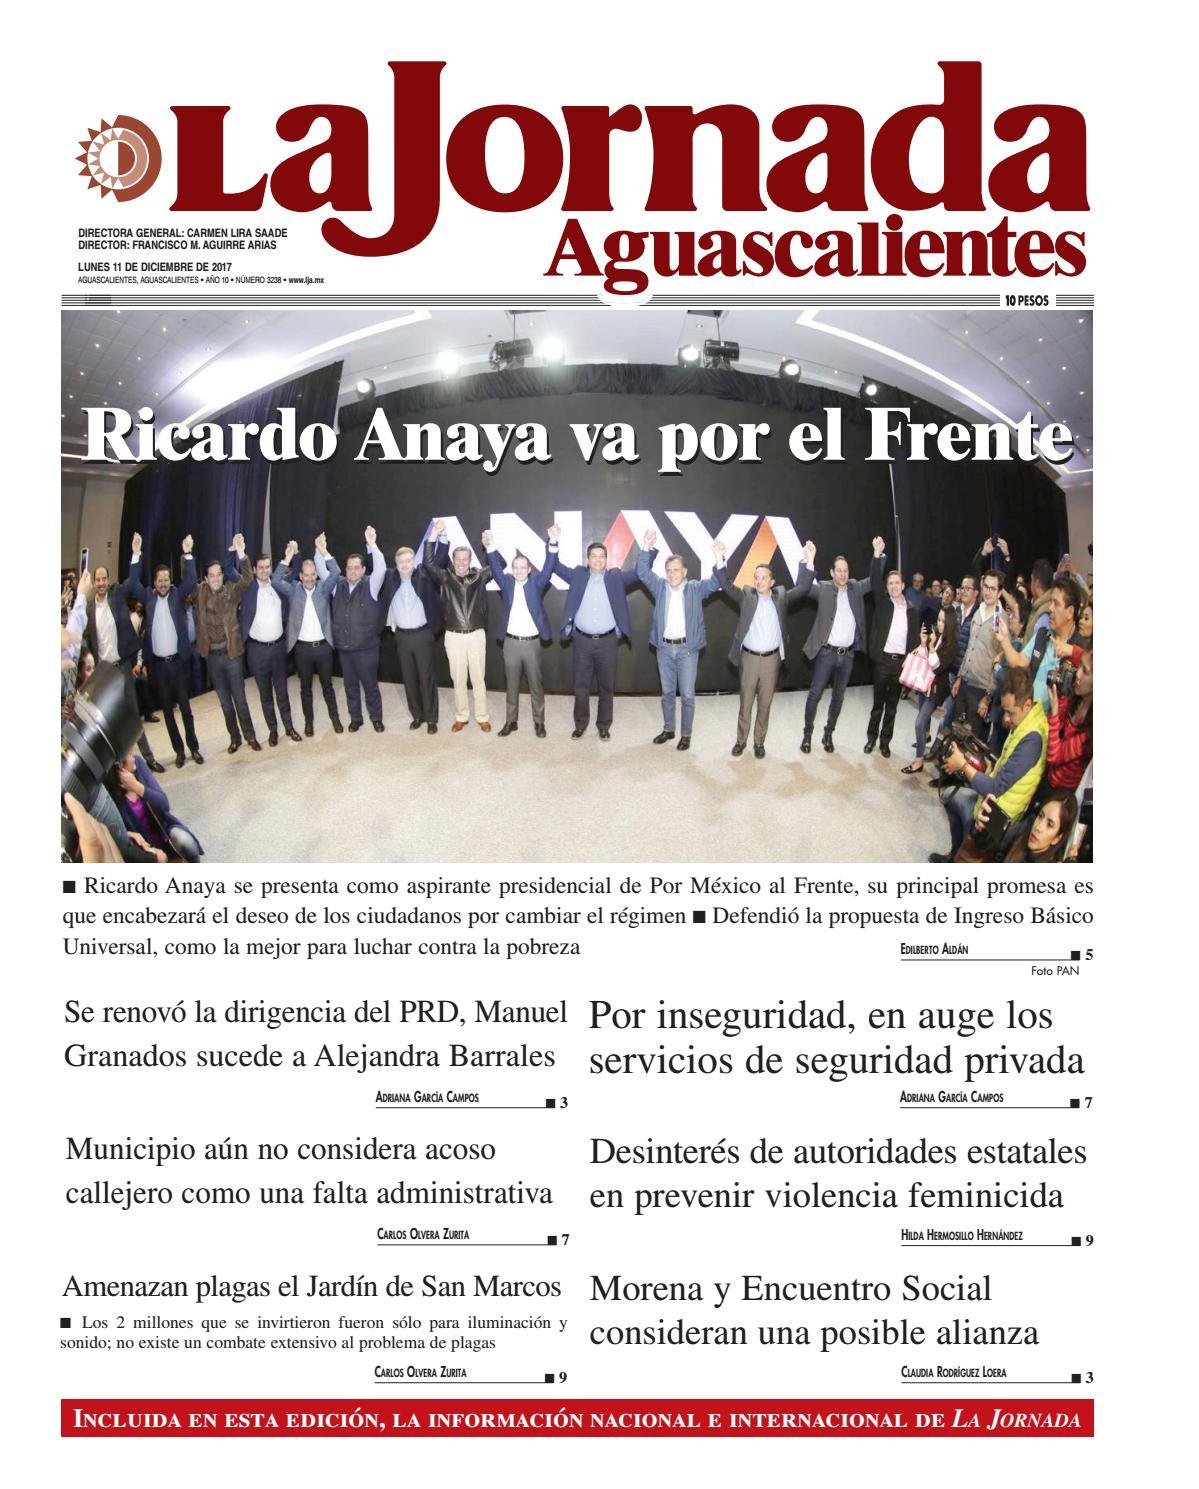 LJA11122017 by La Jornada Aguascalientes - issuu